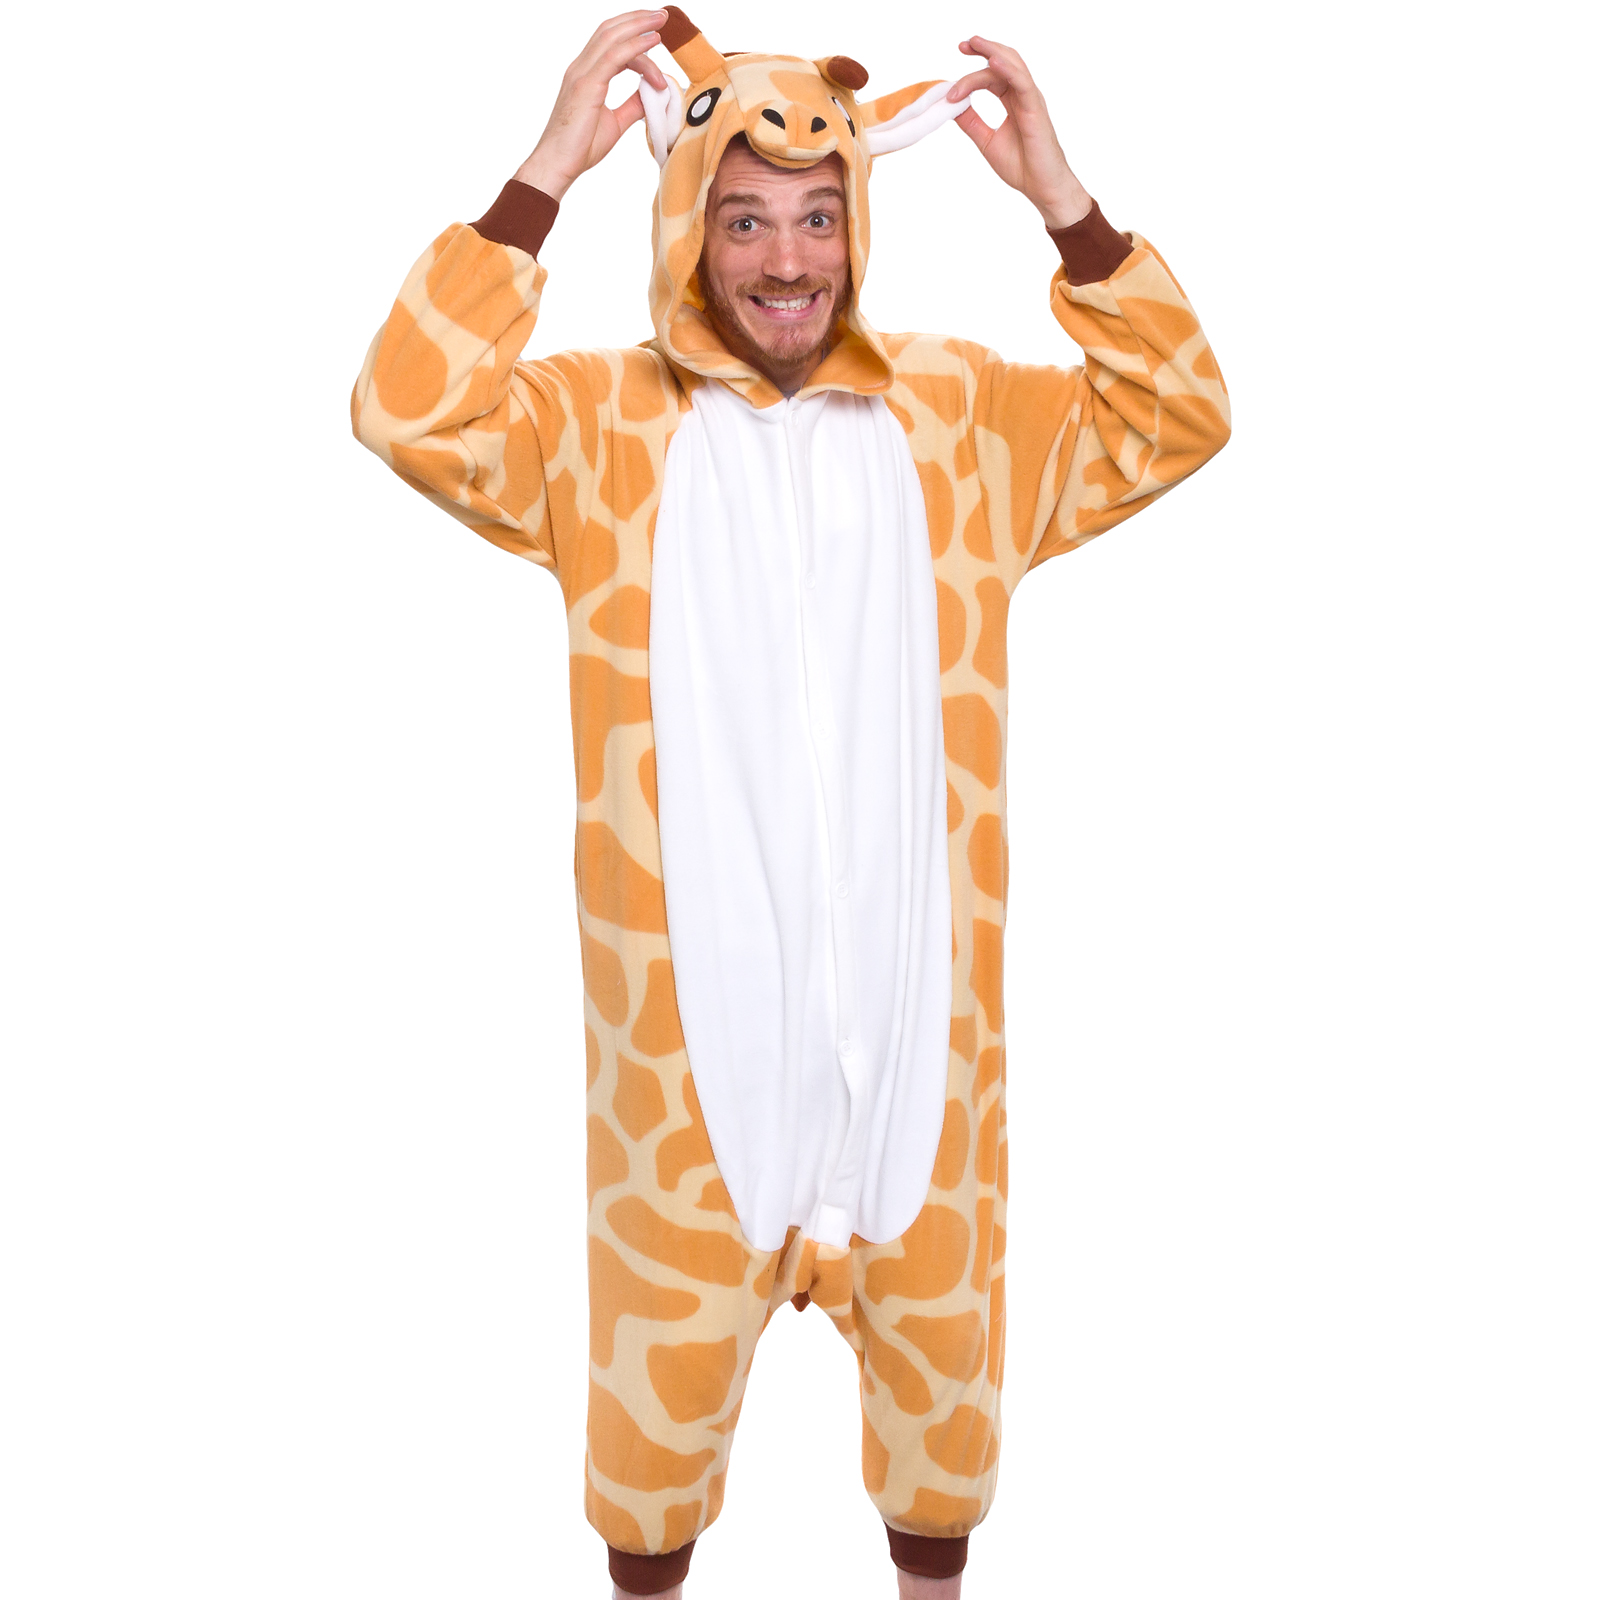 silver lilly unisex adult plush animal cosplay costume pajamas giraffe walmartcom